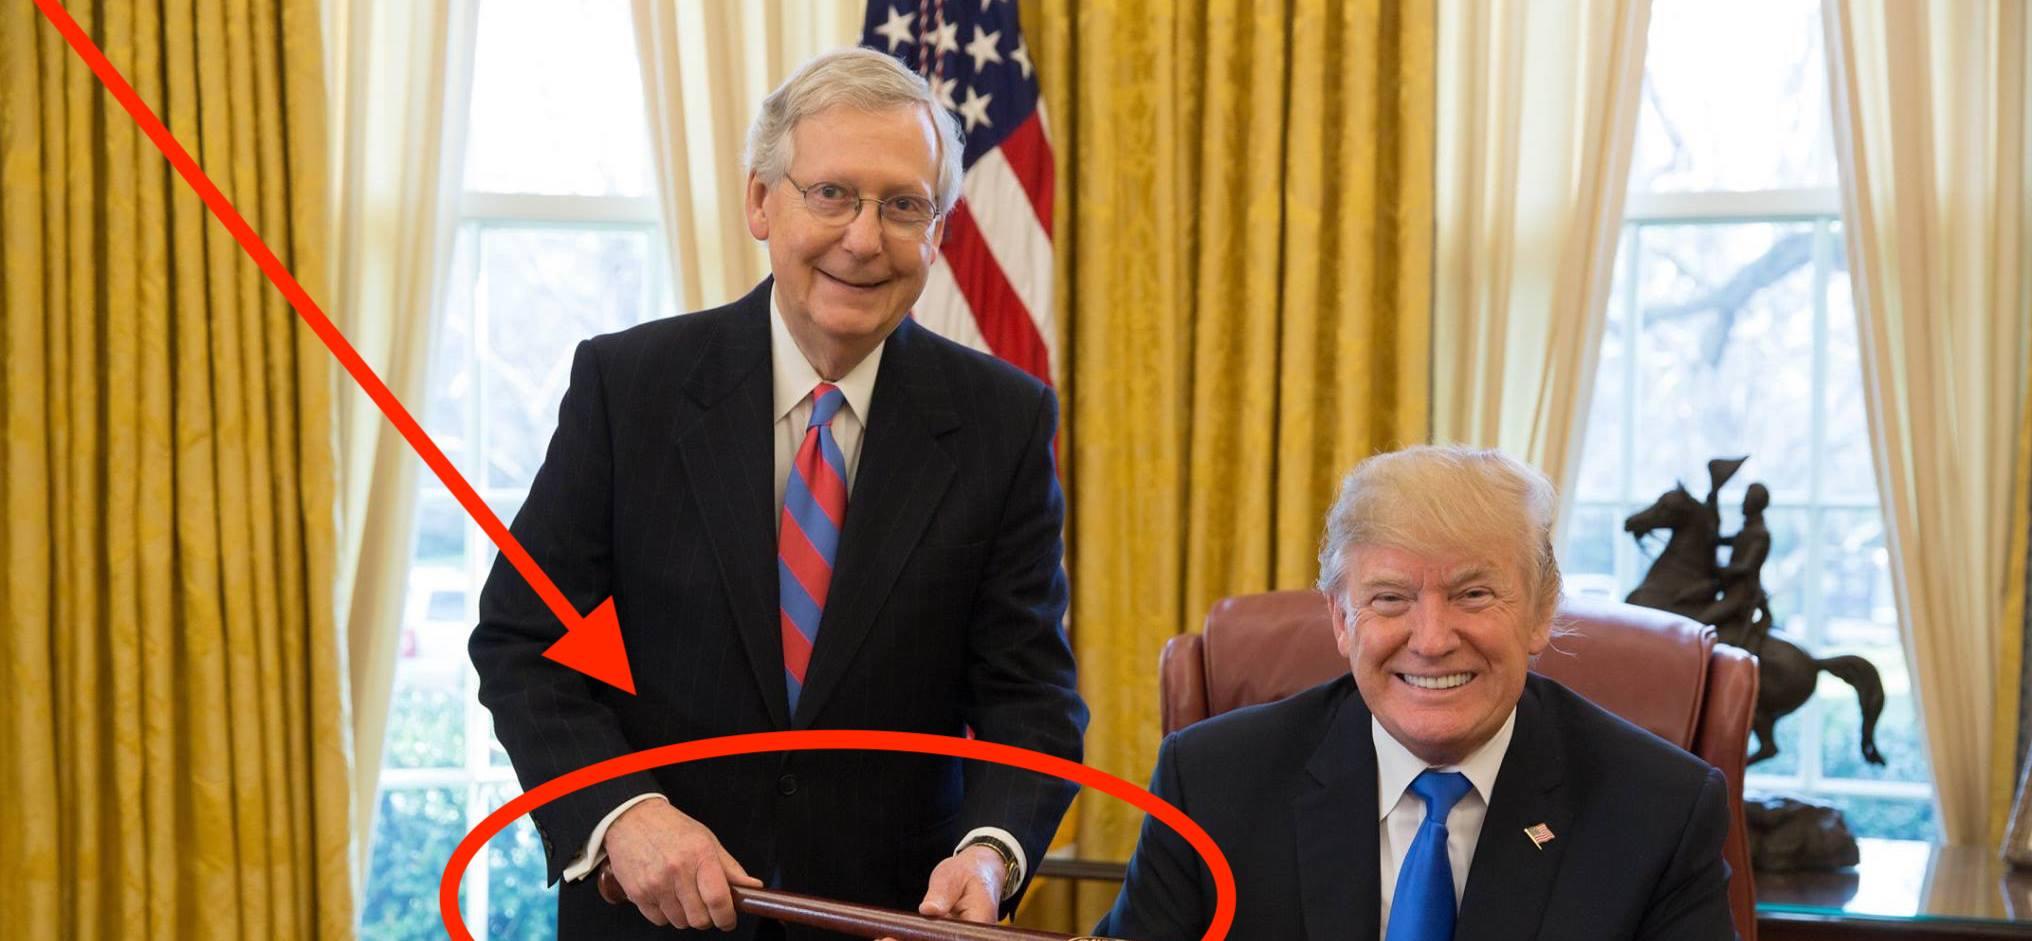 Facebook: Senator Mitch McConnell